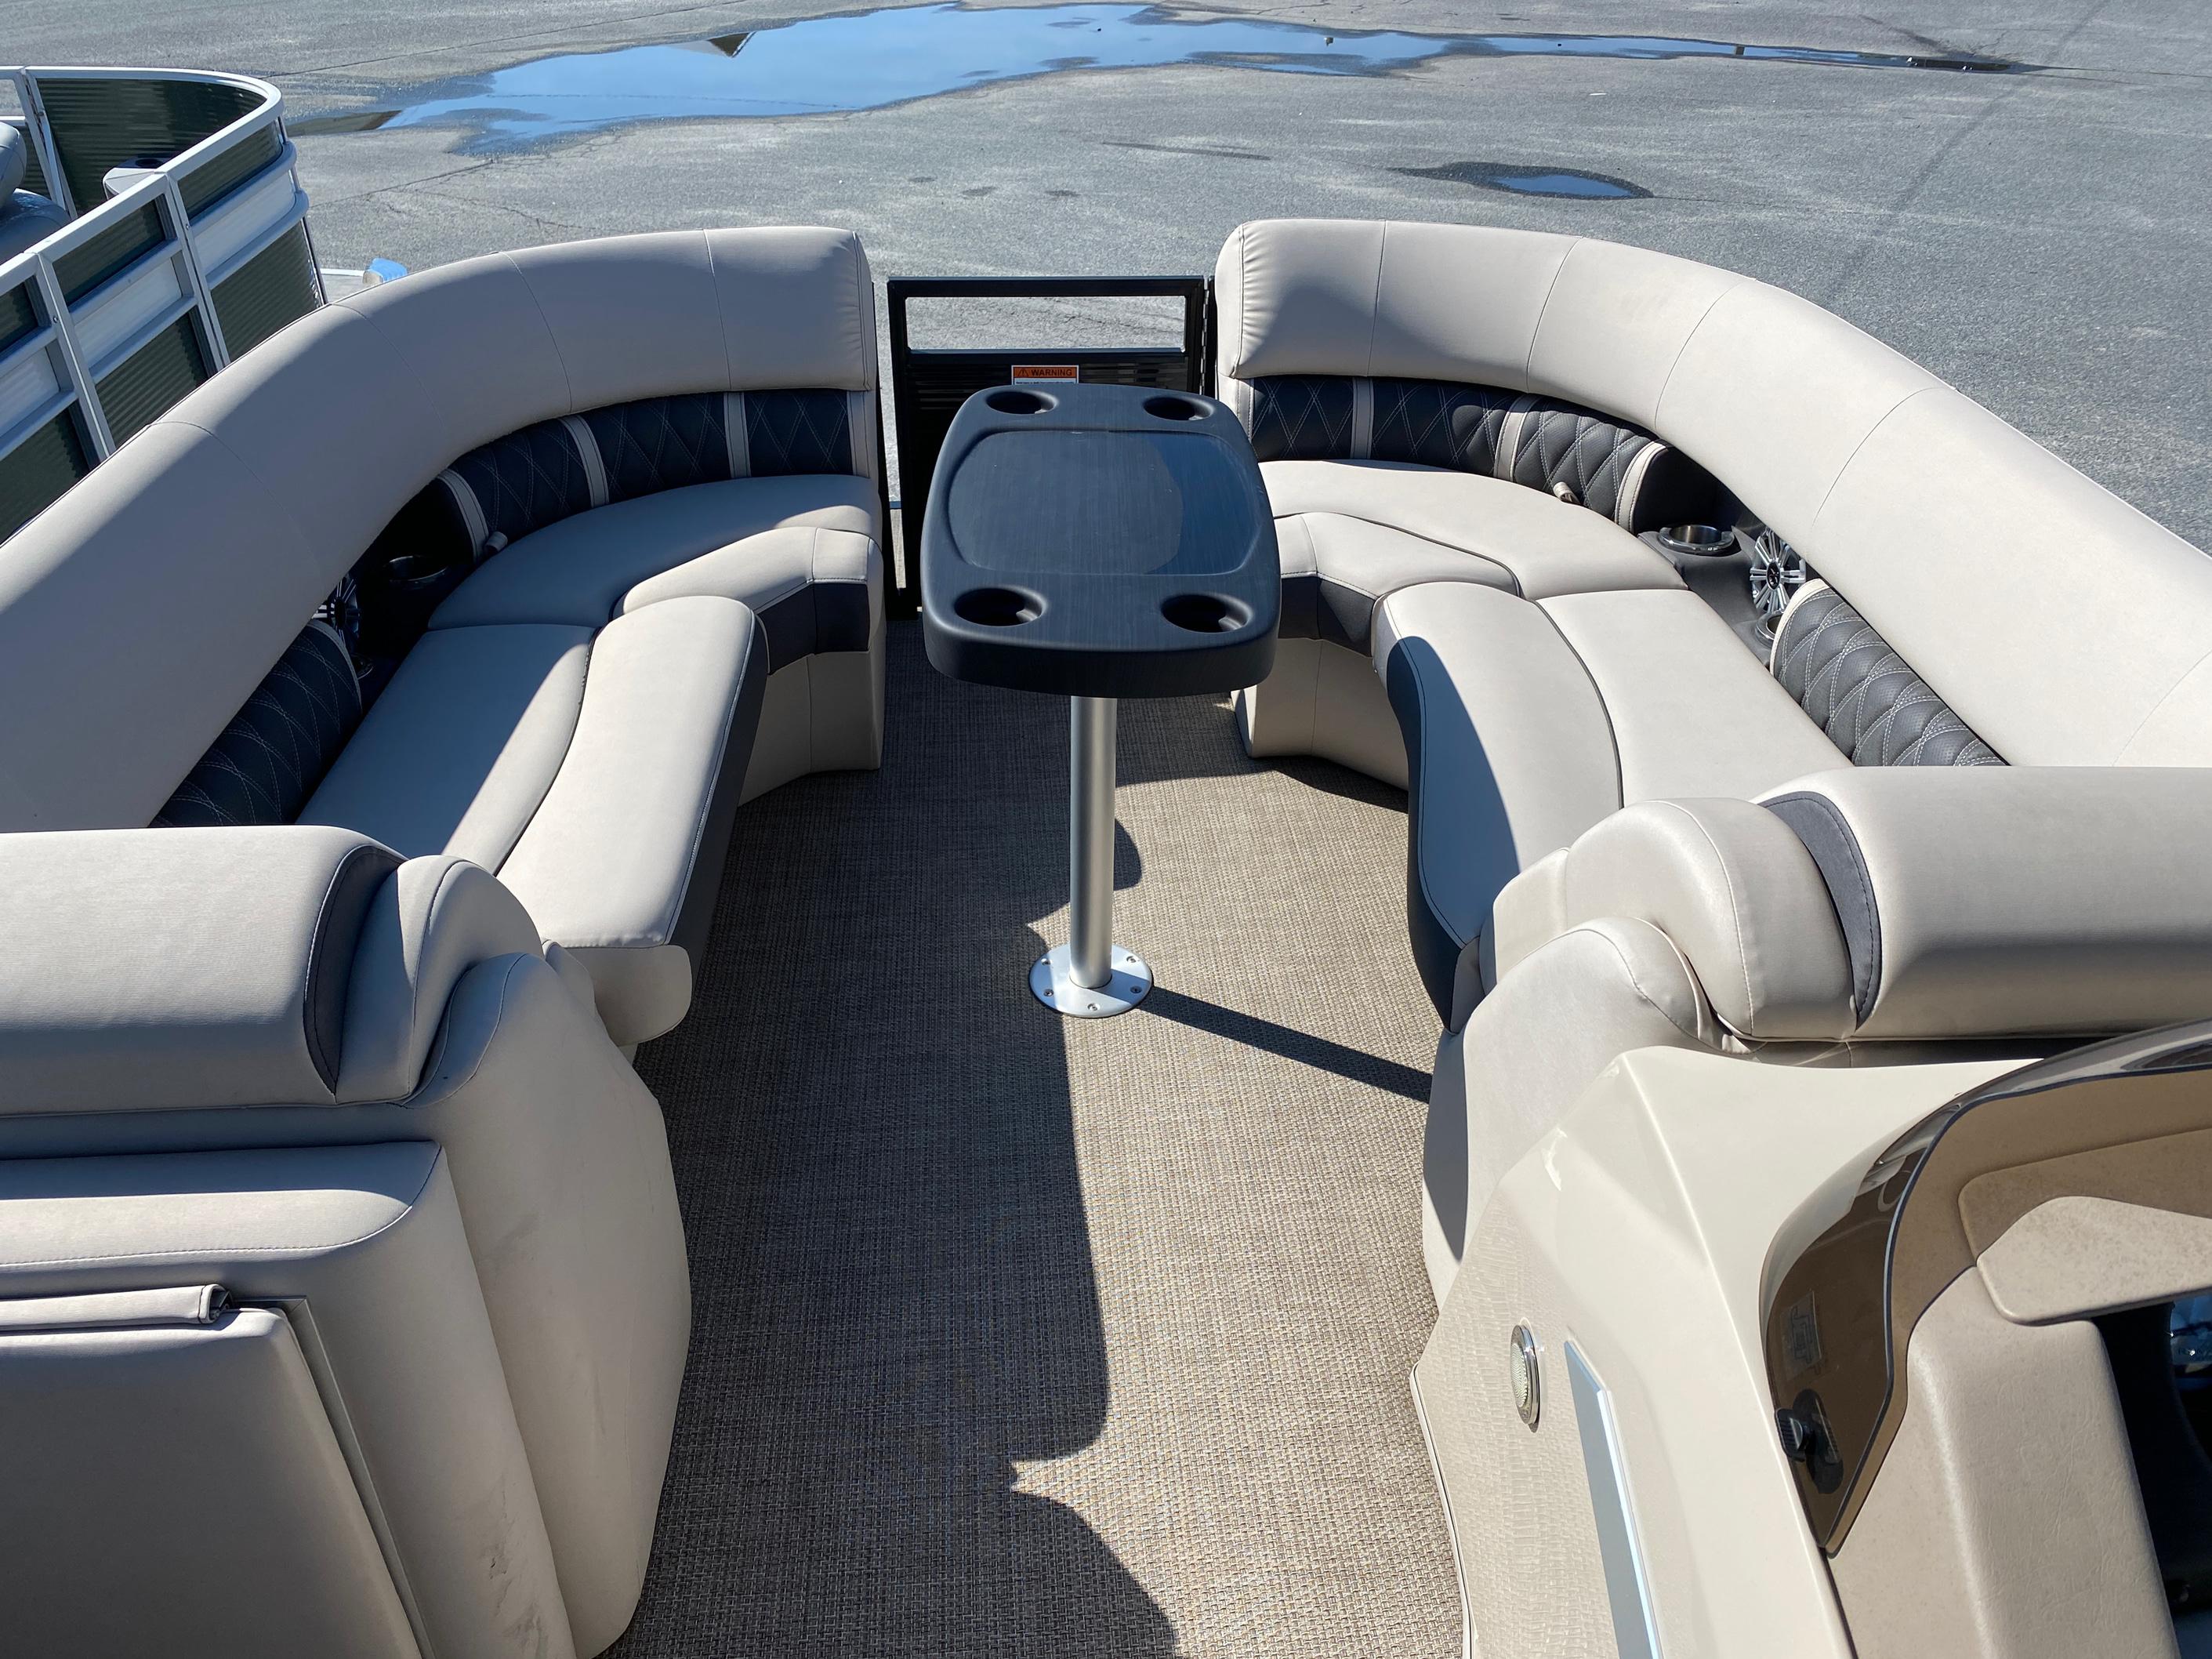 2019 Bennington boat for sale, model of the boat is 23 GSR & Image # 4 of 10